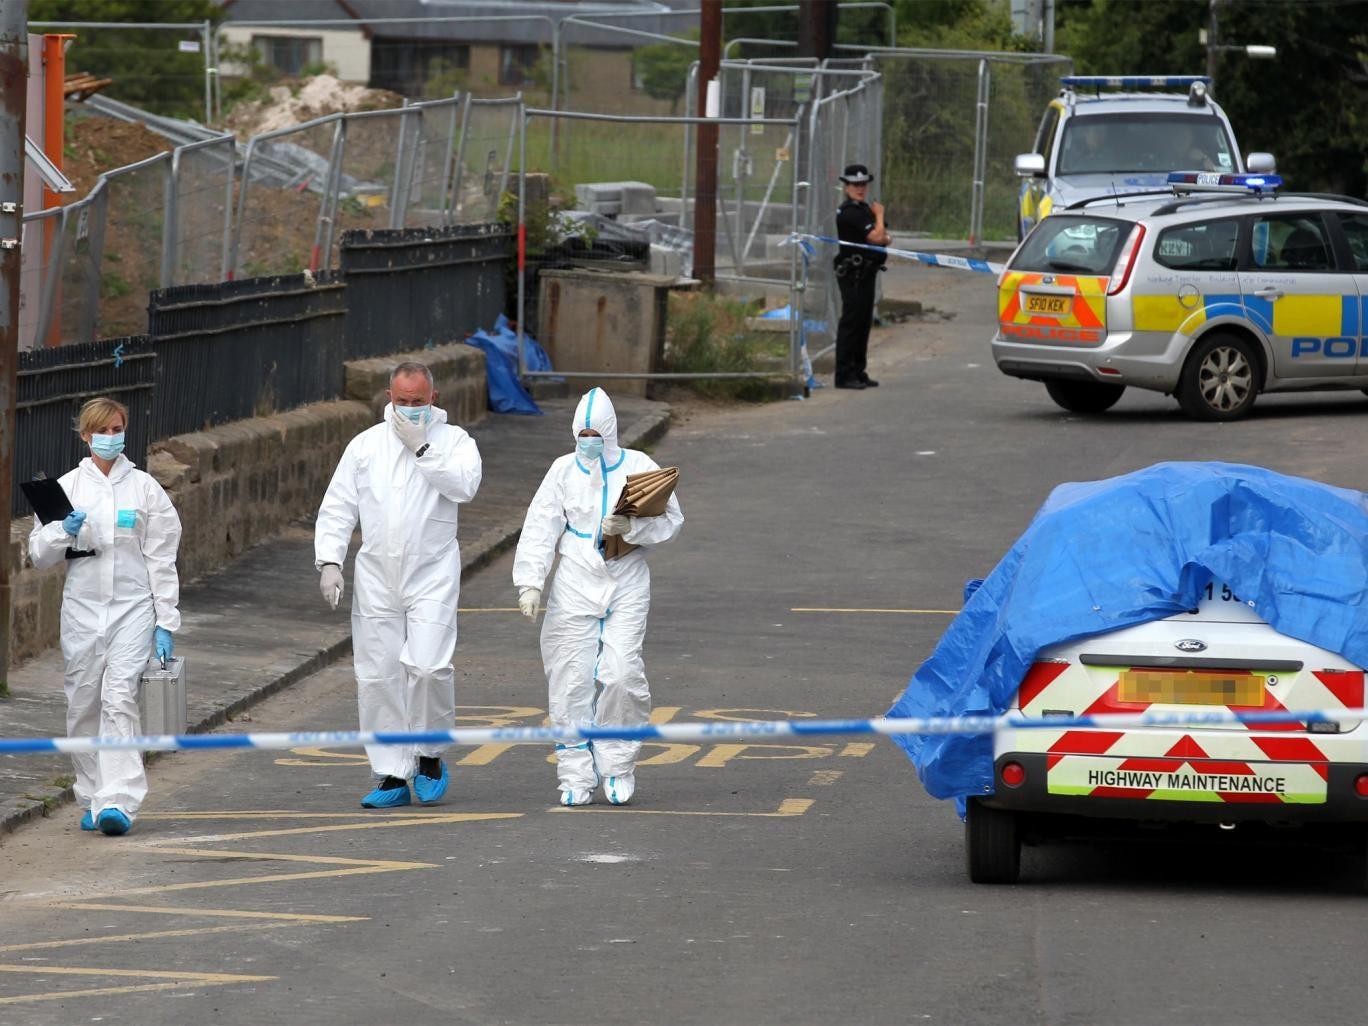 Police forensics examine the scene on Auldhouse main street